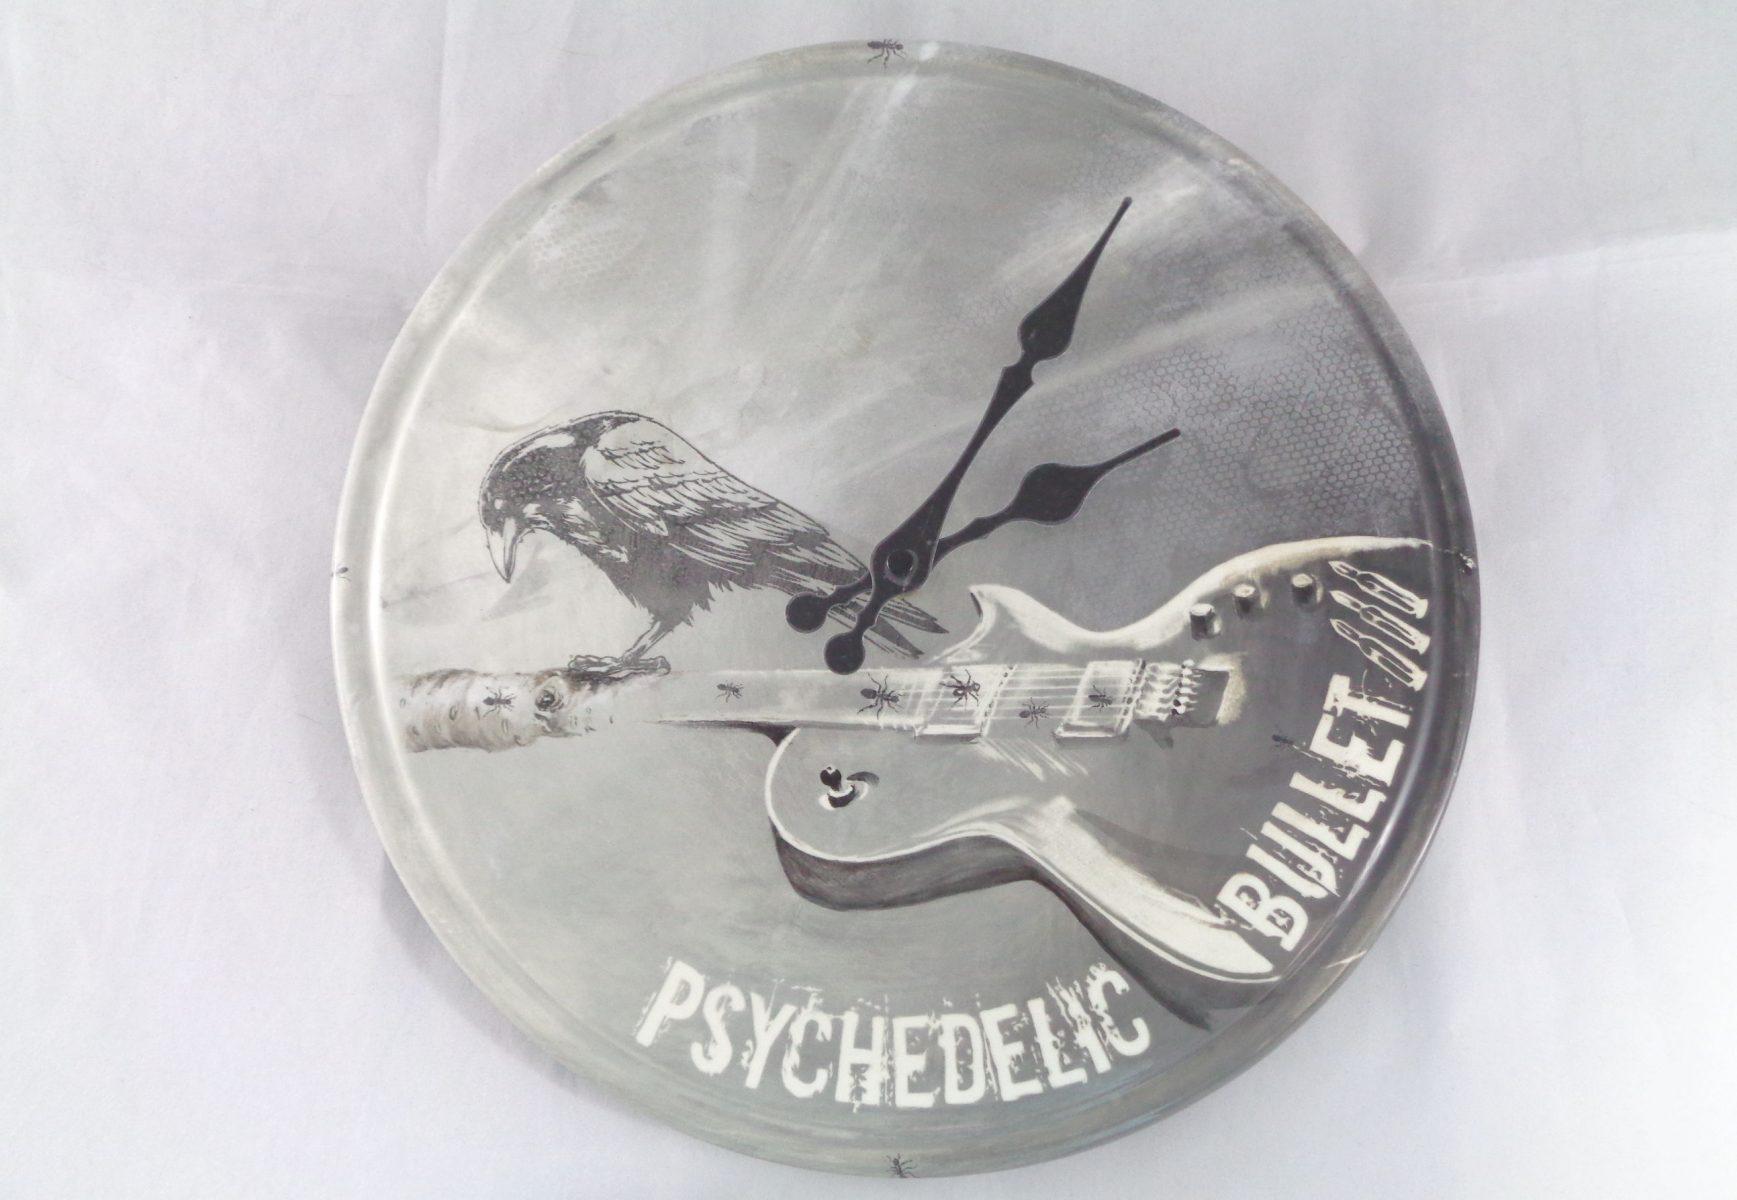 Bemalte Keramik Uhr Psychedelic Bullet